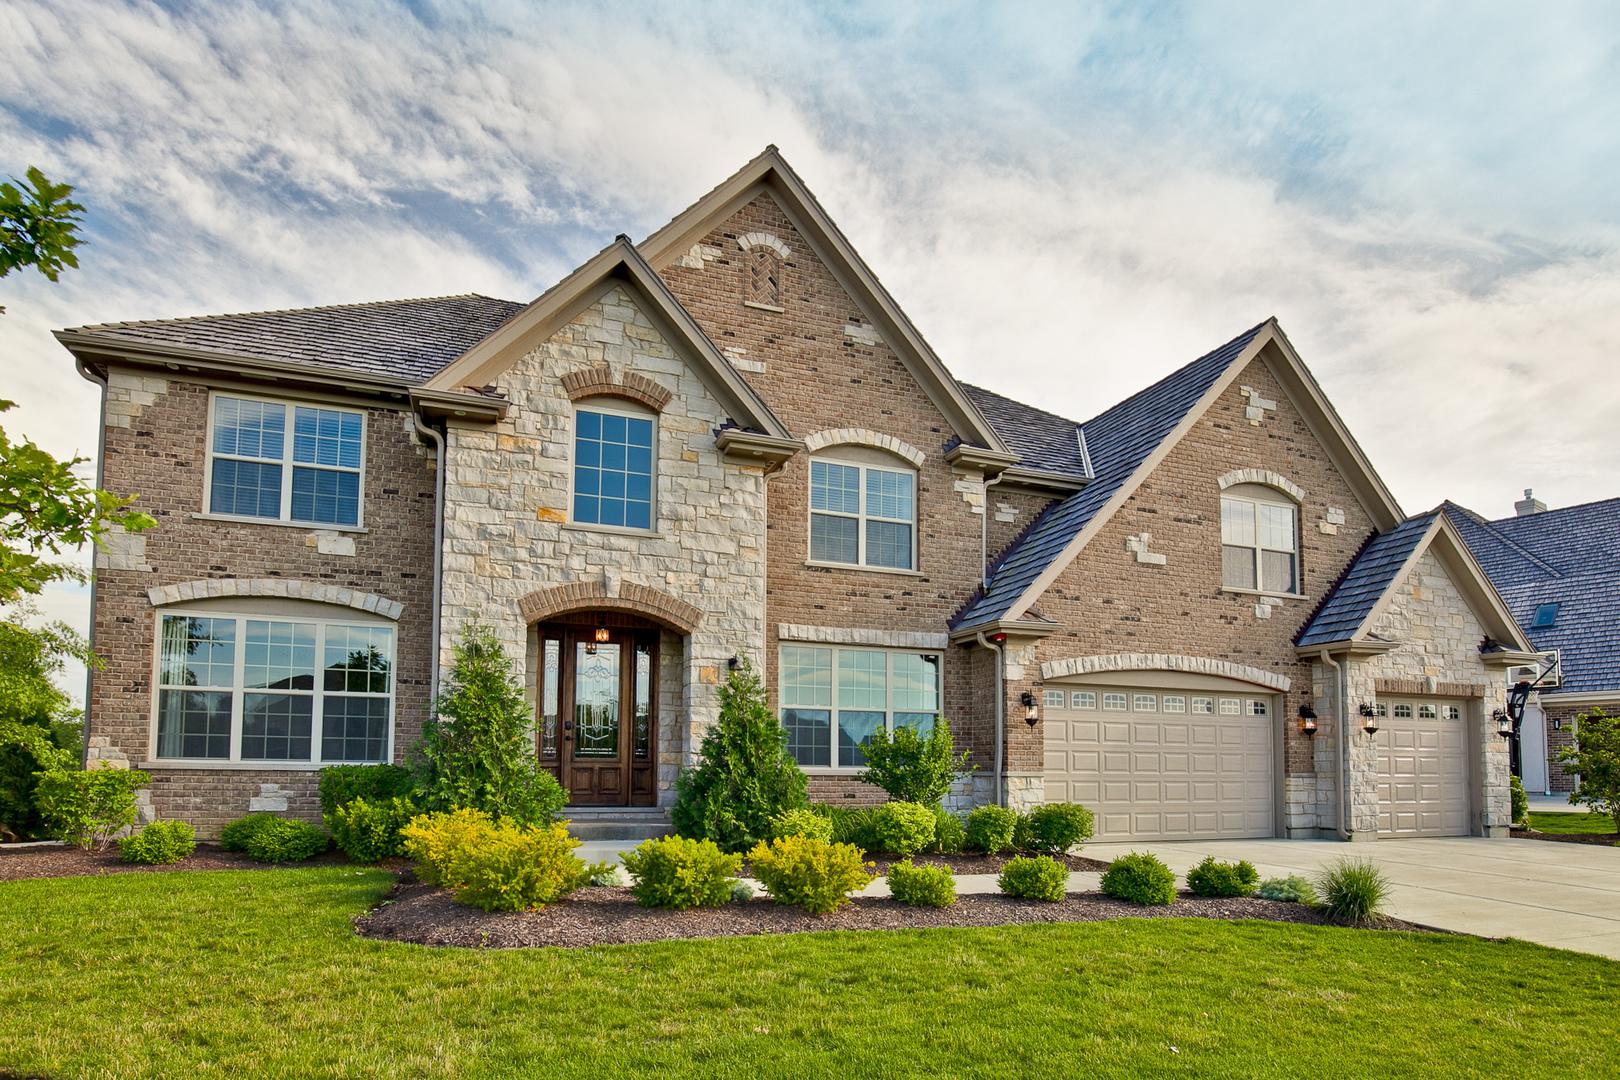 vernon hills illinois homes for sale